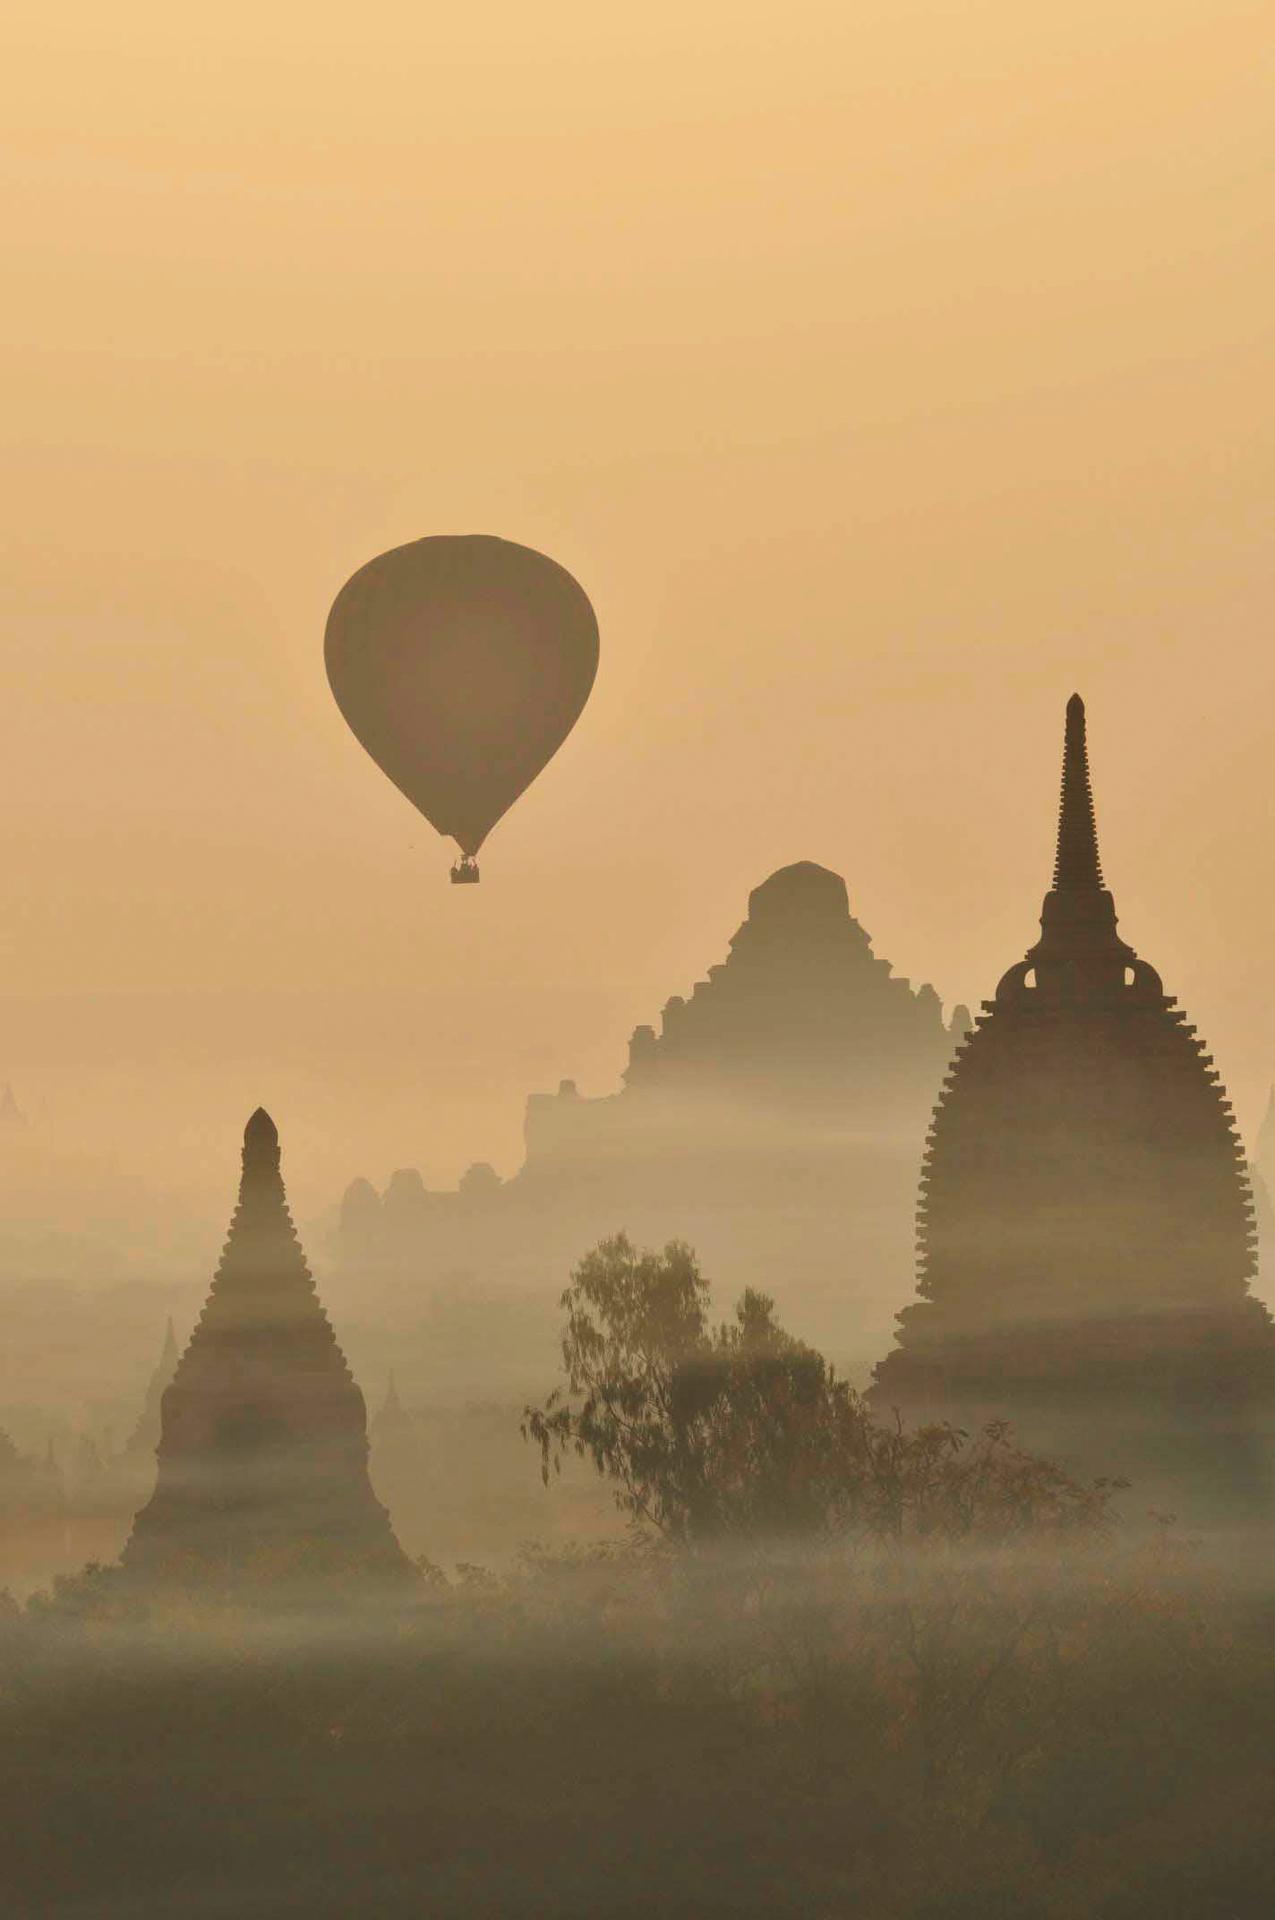 Balloons over Old Bagan, Myanmar